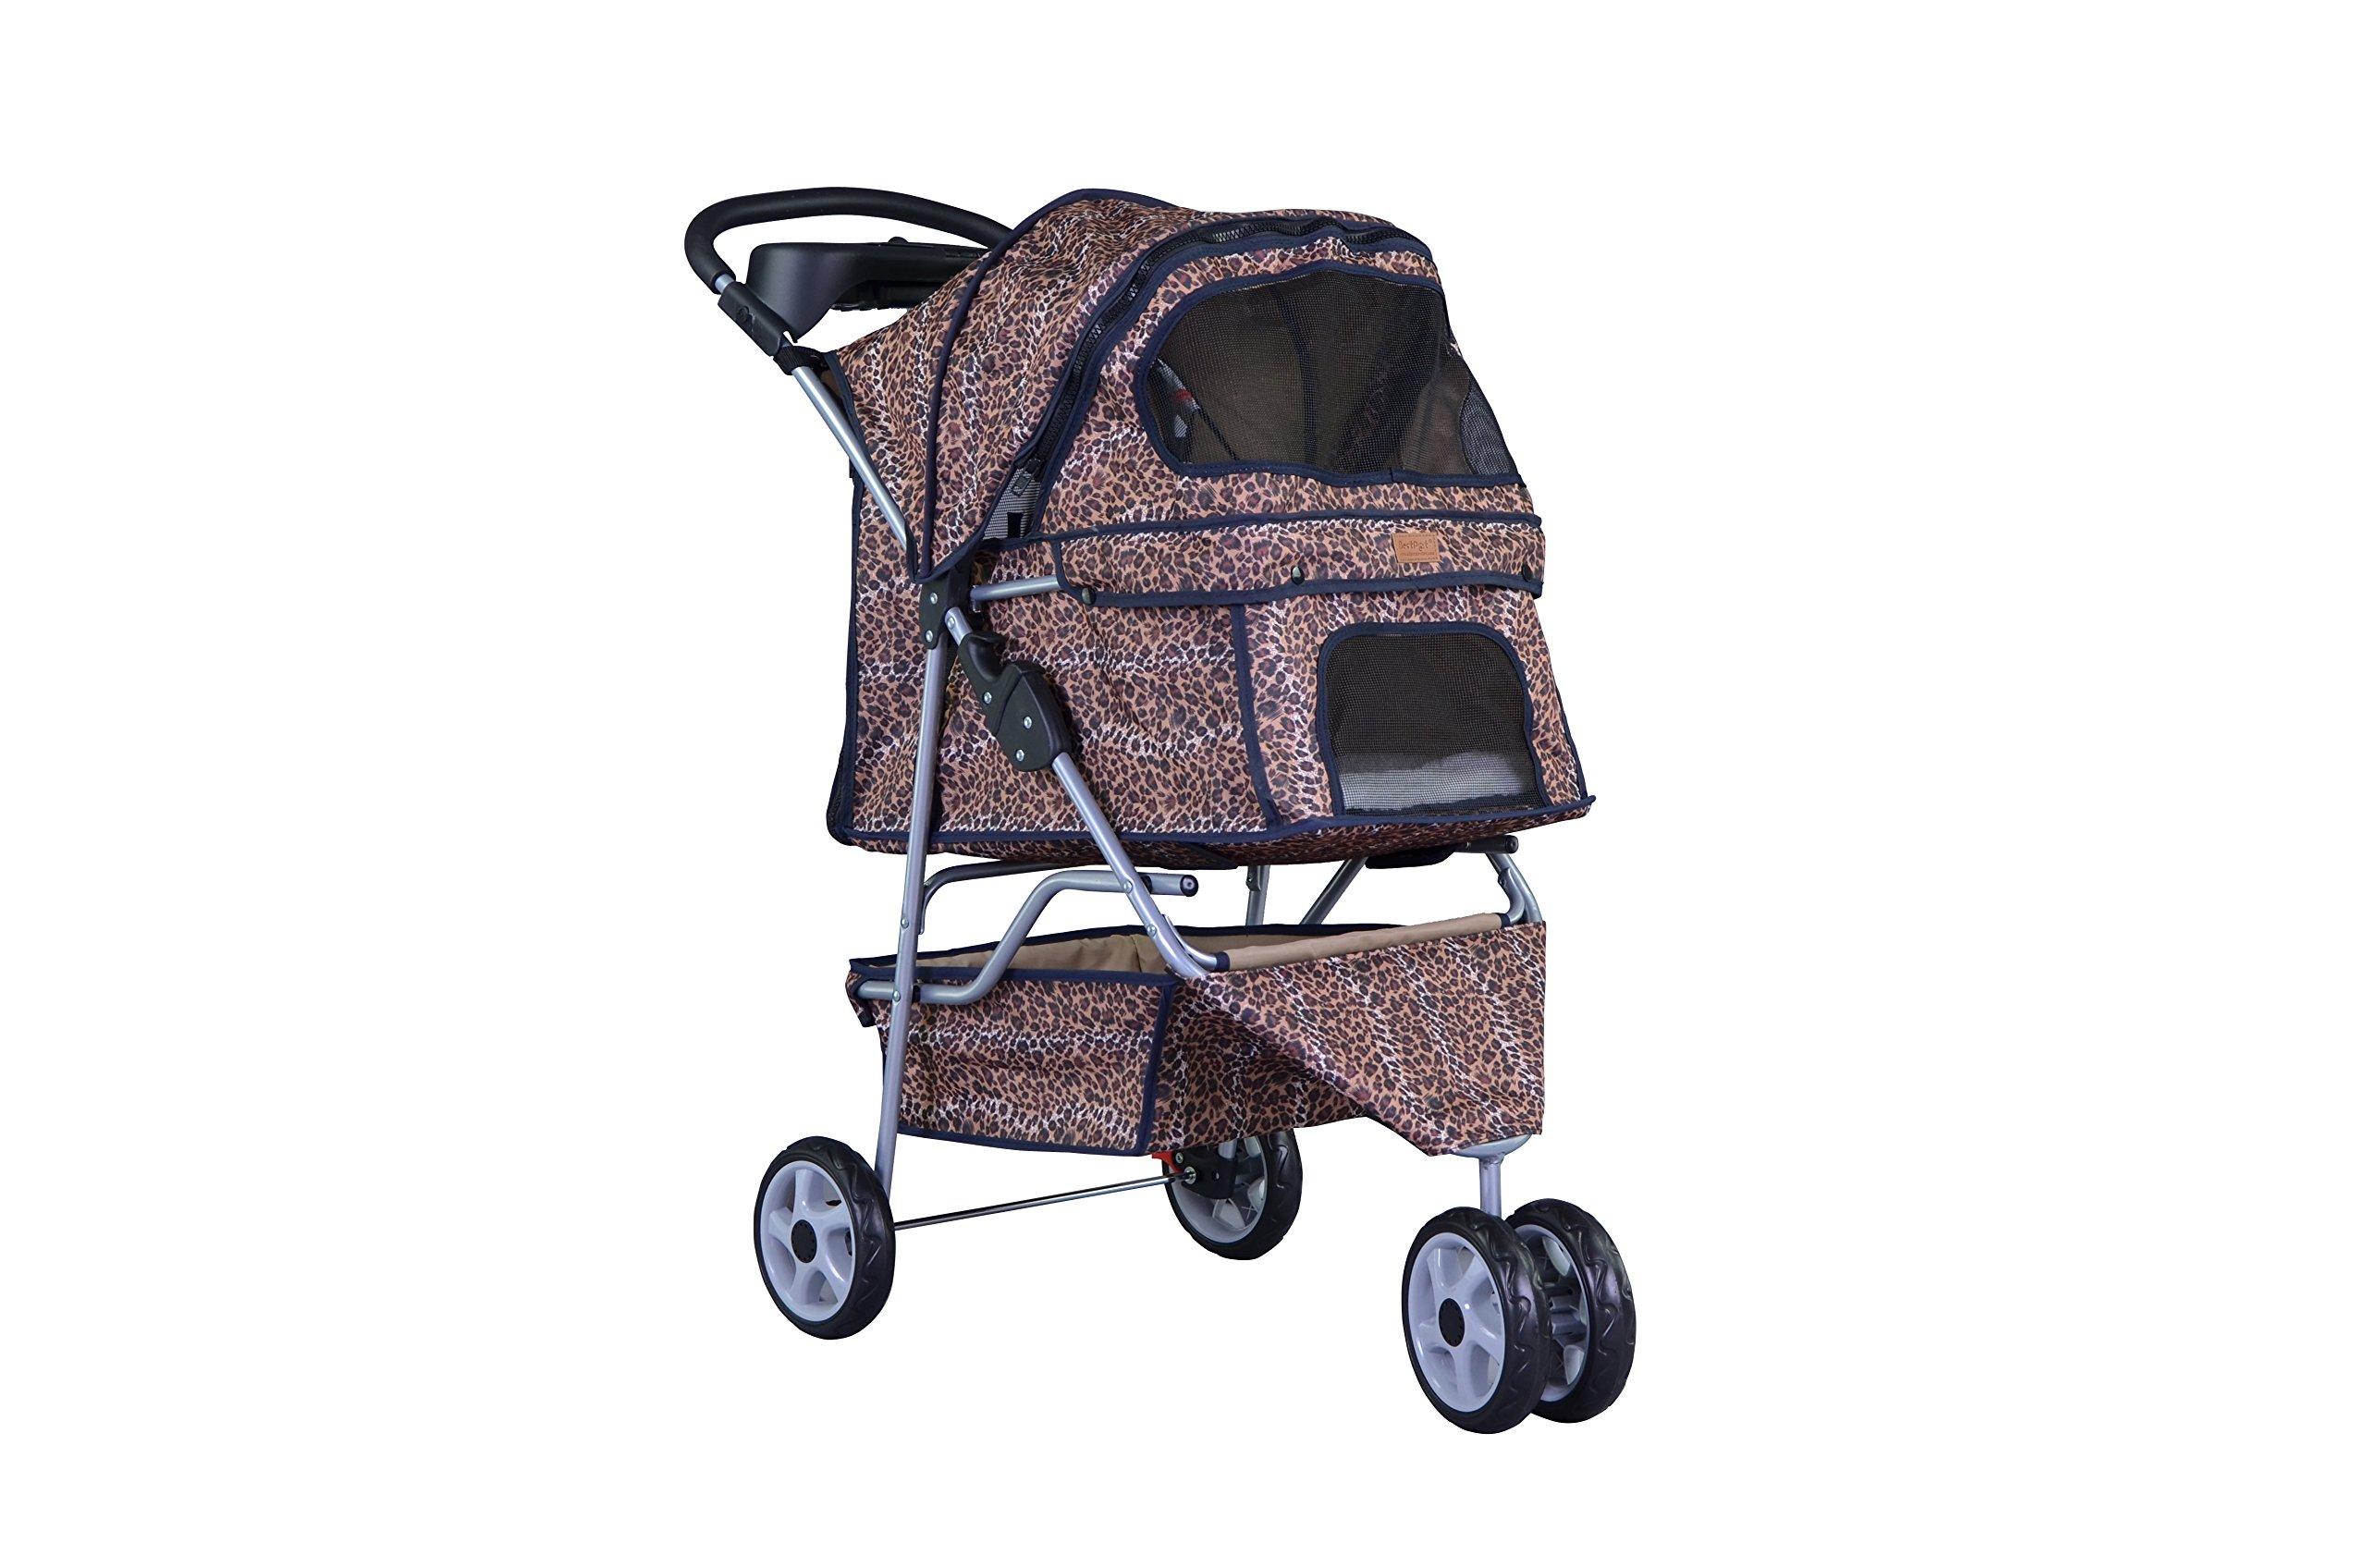 All Terrain Extra Wide 3 Wheels Pet Dog Cat Stroller w/RainCover Leopard Skin